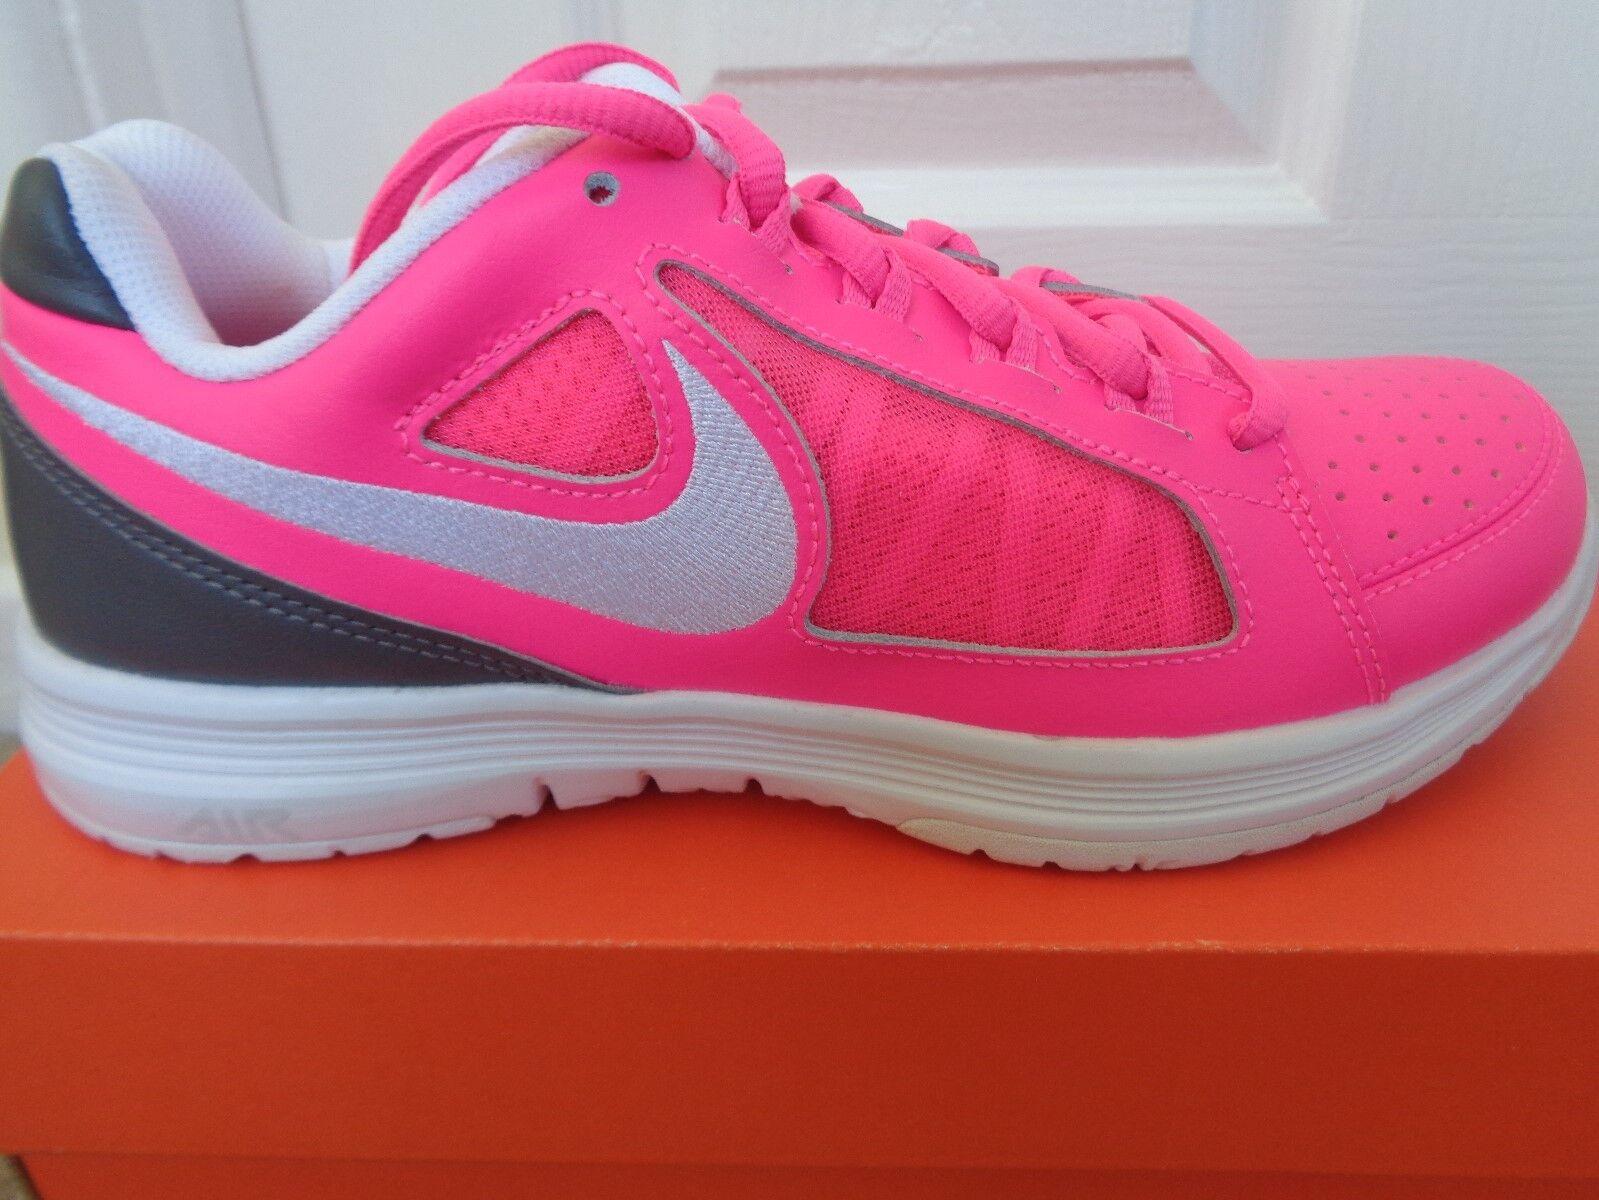 Nike Air Vapor Ace wmns trainers baskets 724870 610 uk 4.5 eu 38 us 7 NEW+BOX